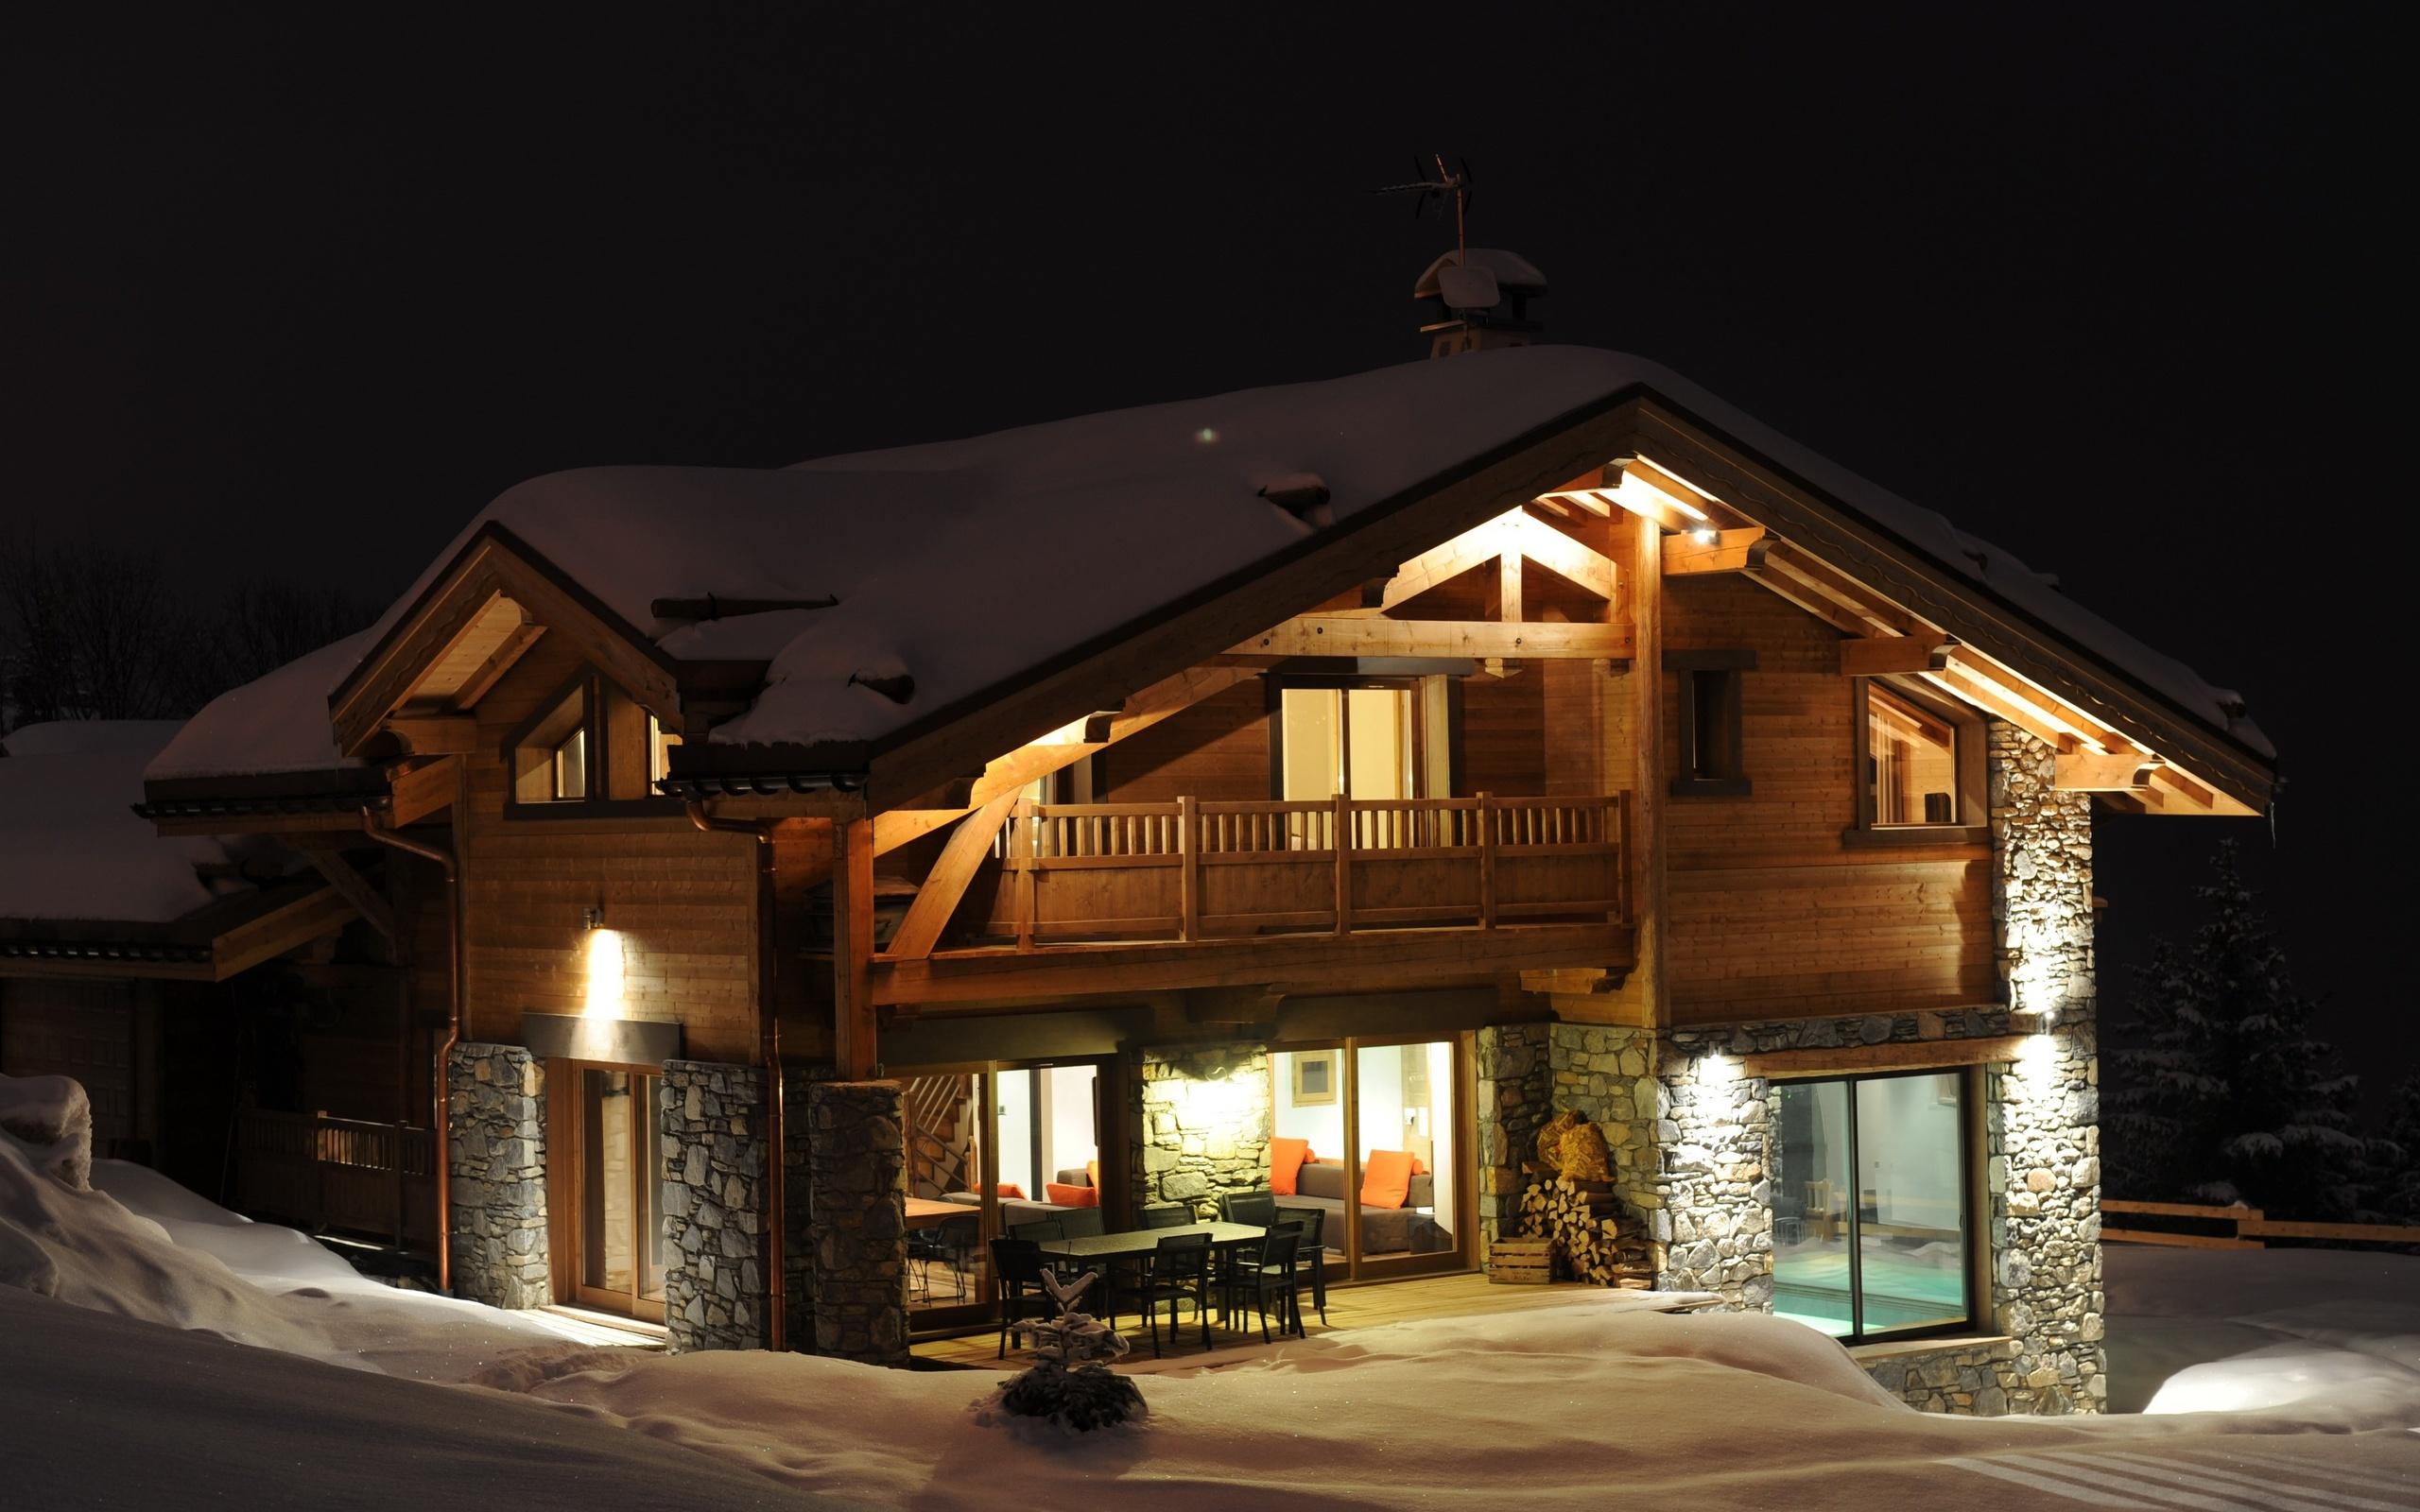 Night snow doa lighting home winter comfort wallpaper for Comfort house